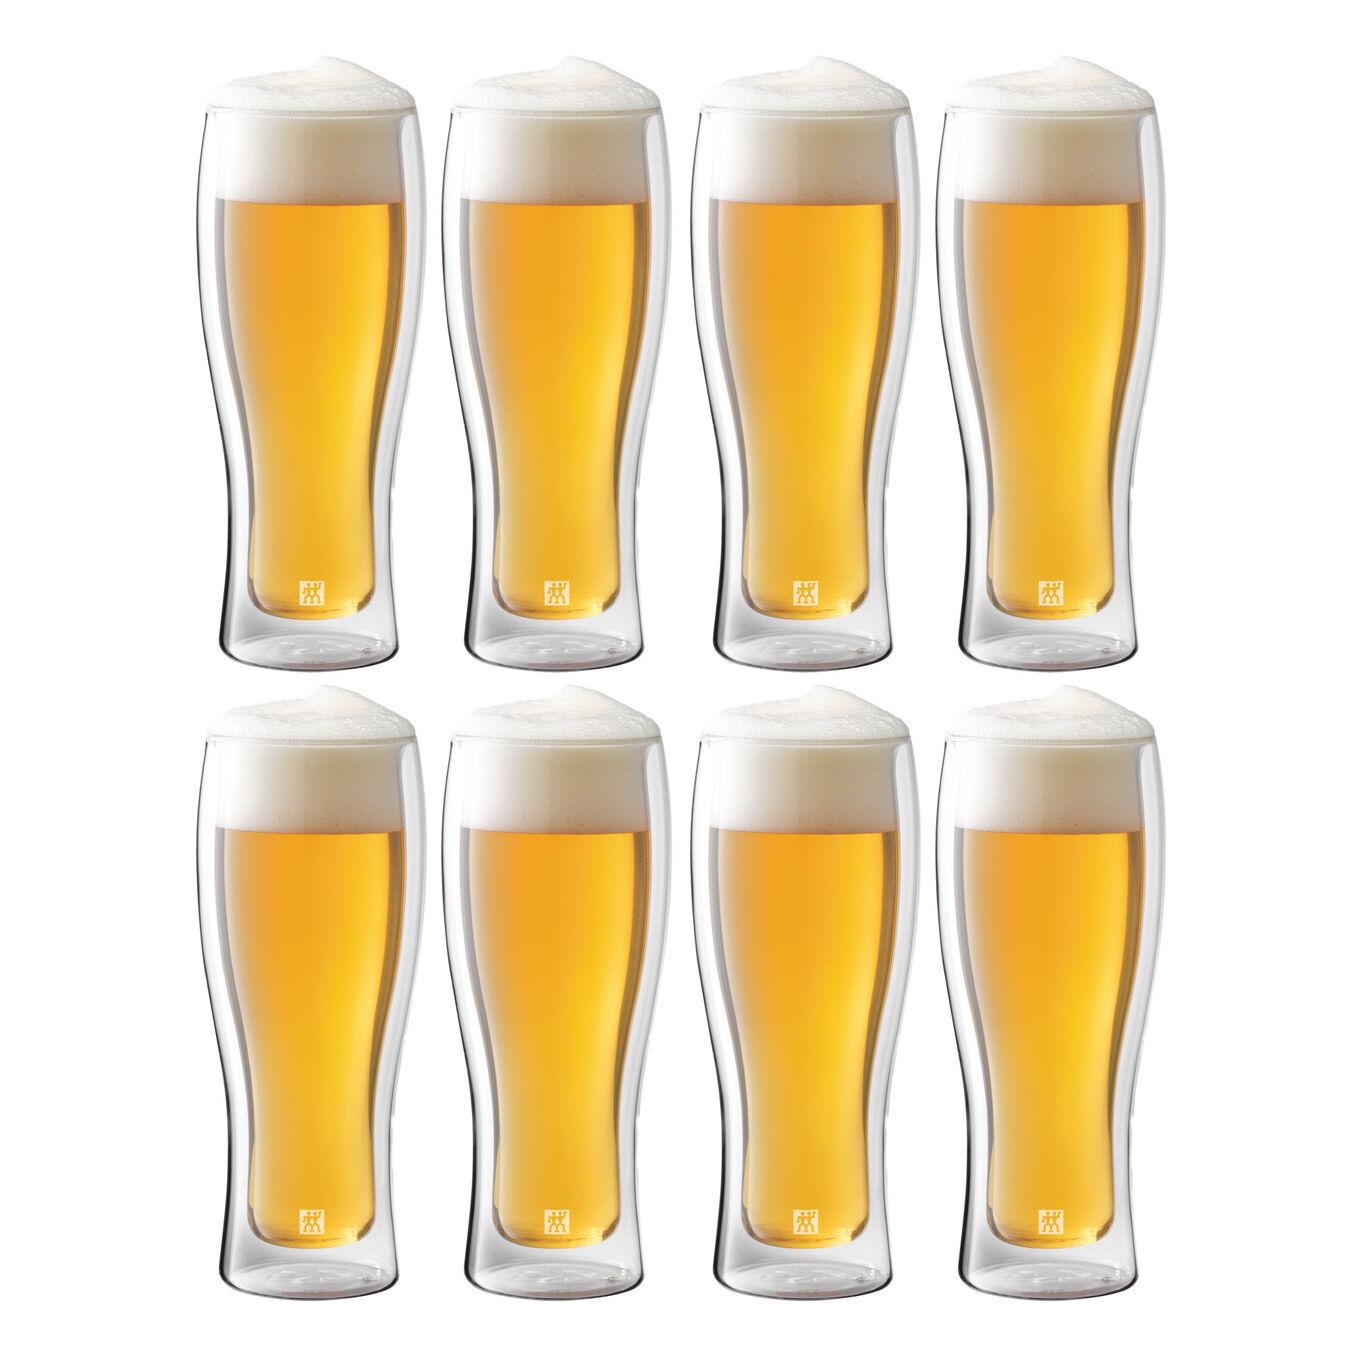 8 Piece Beer Glass Set - Value Pack,,large 2